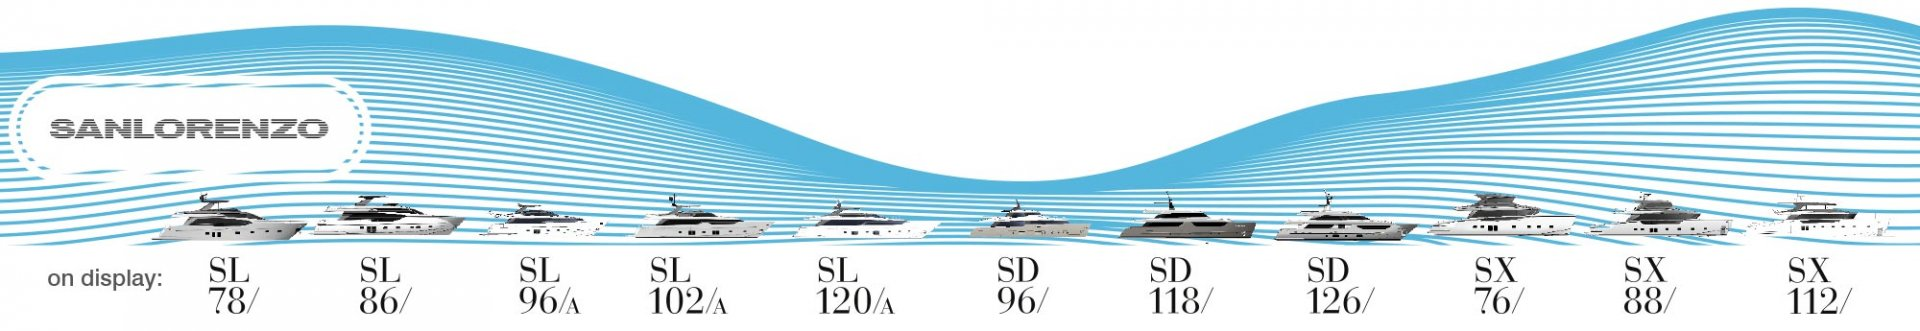 Sanlorenzo line up 2021